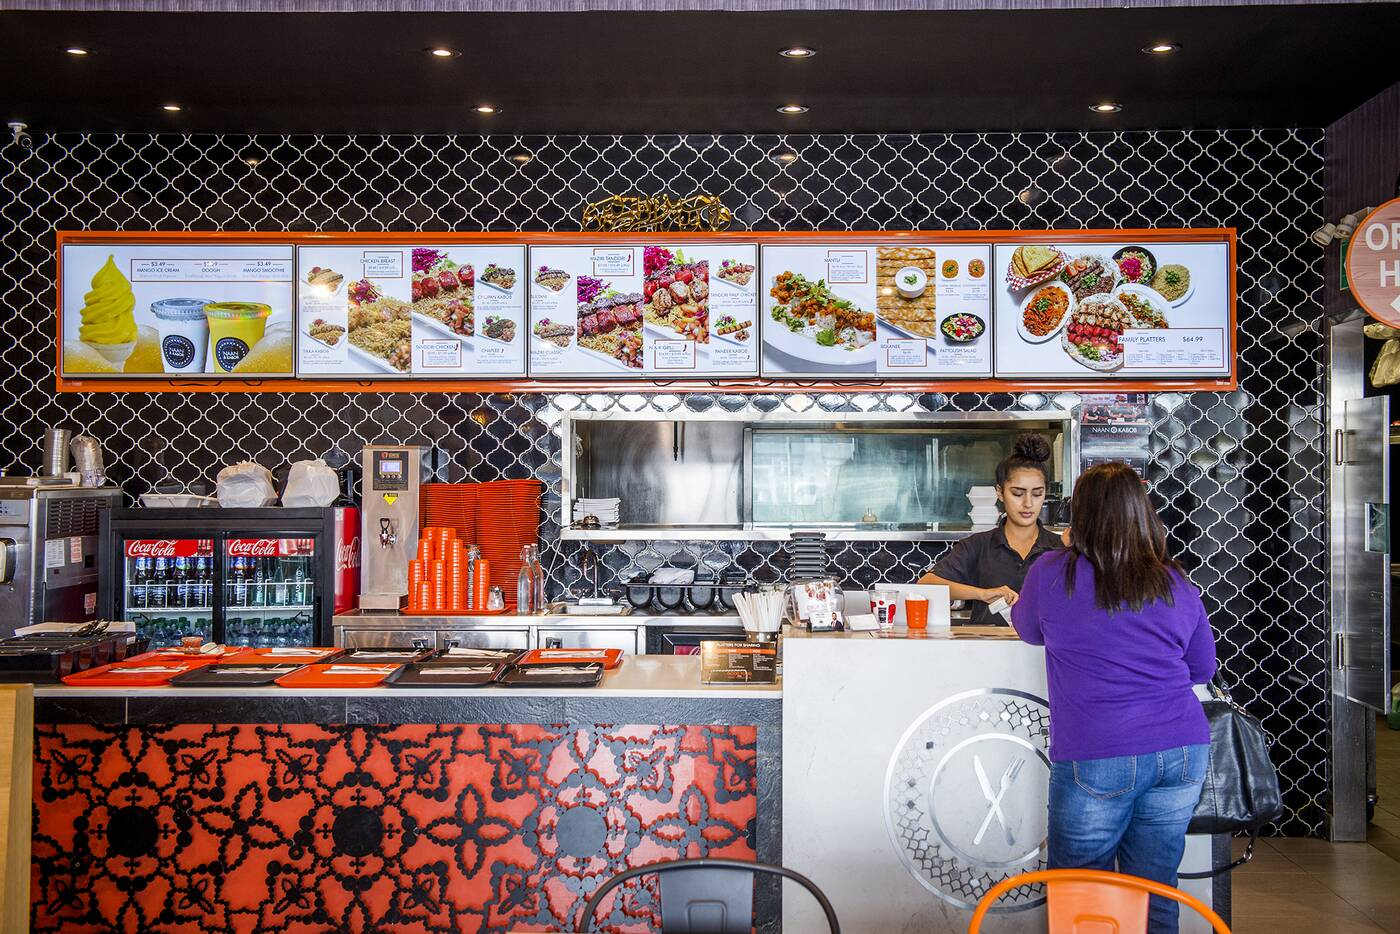 Naan kabob blogto toronto for Classic kebab house stechford